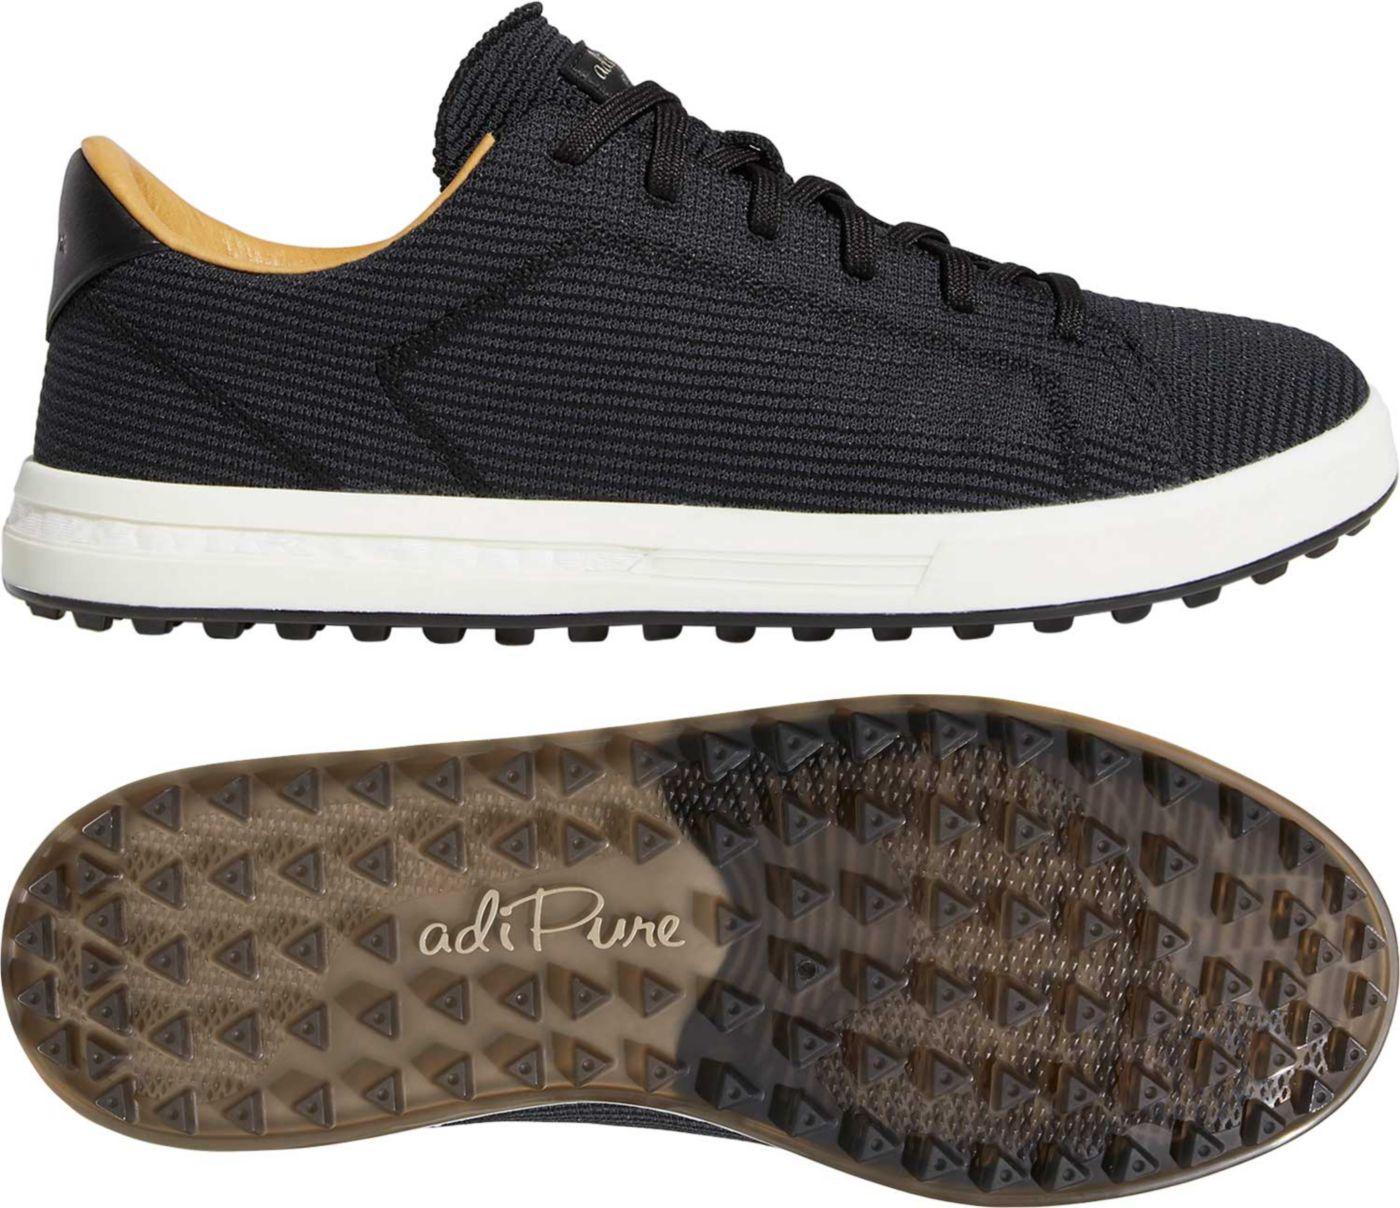 adidas Men's adipure Golf Shoes